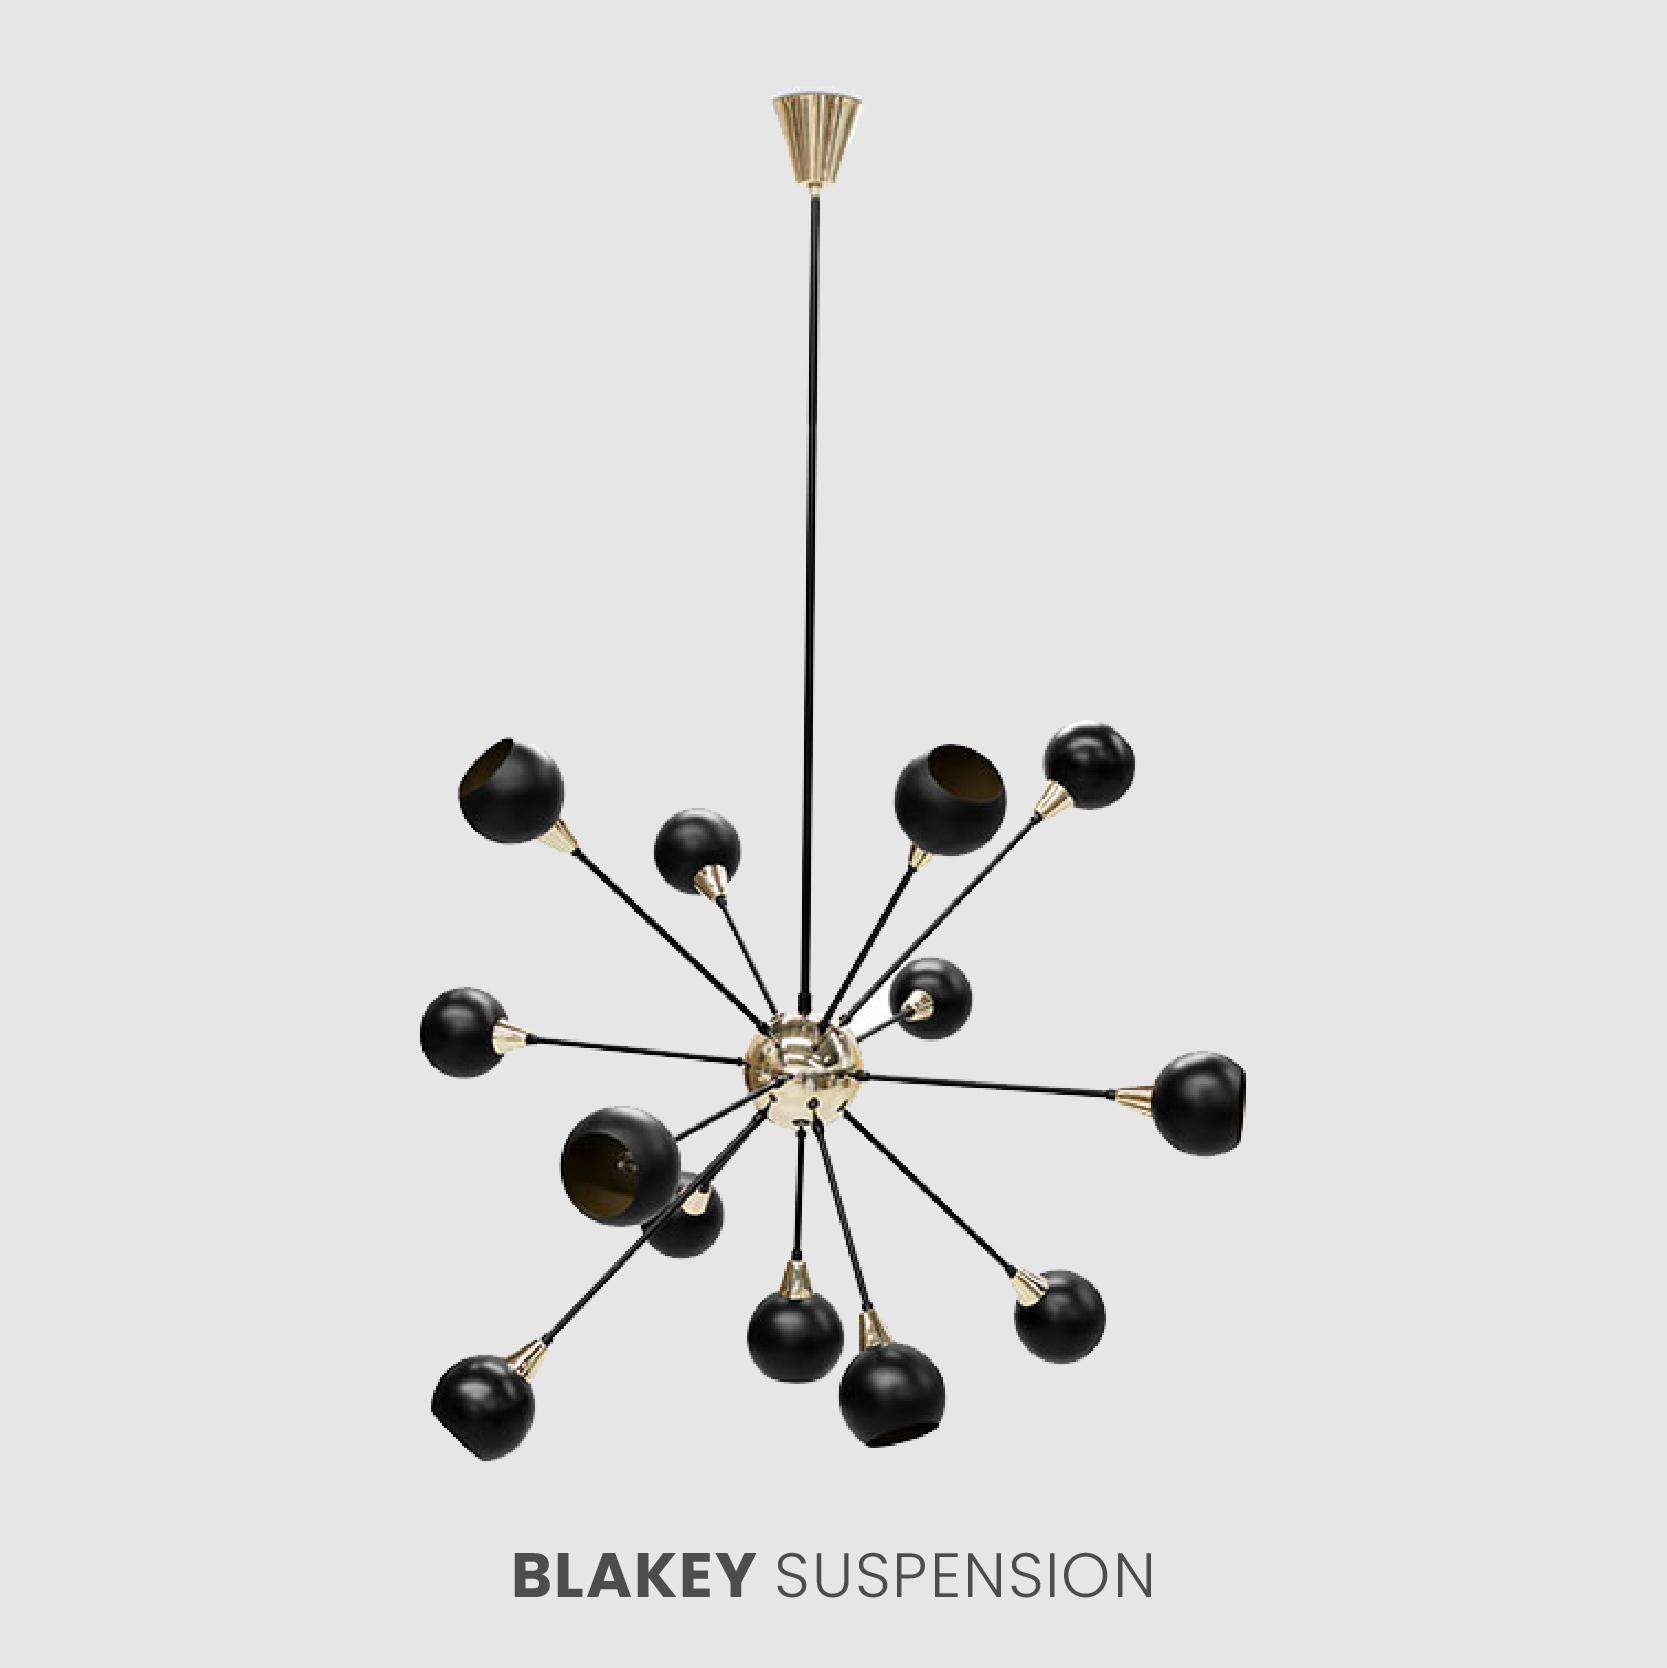 Blakey Suspension